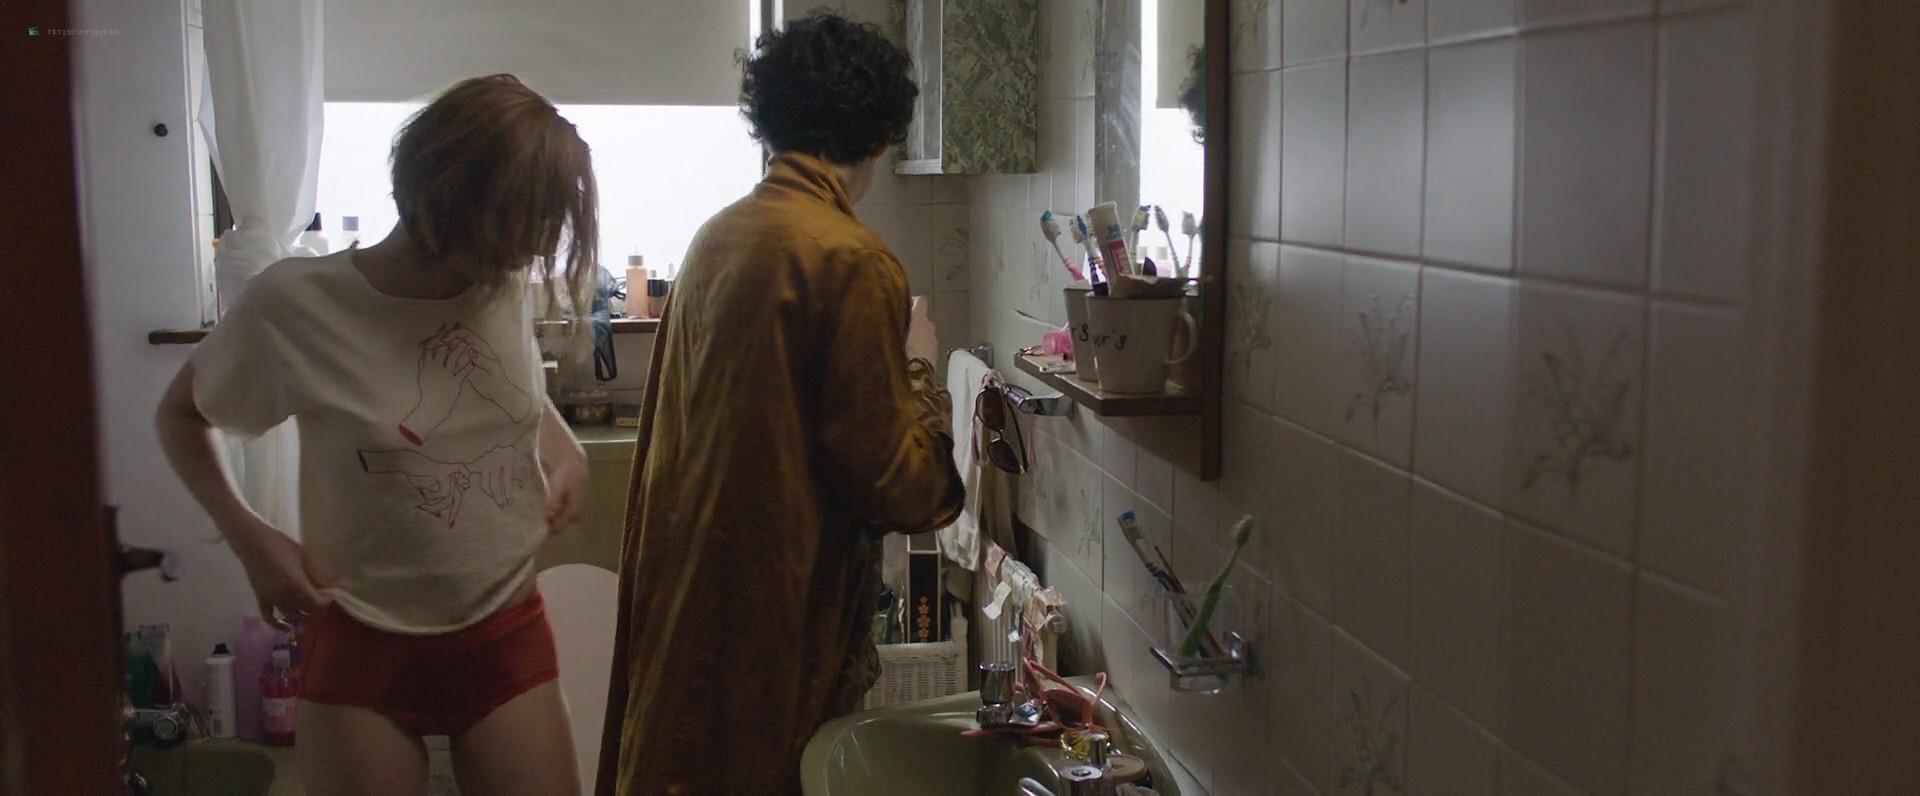 Holliday Grainger hot sex Amy Molloy nude Alia Shawkat sexy - Animals (2019) HD 1080p Web (16)